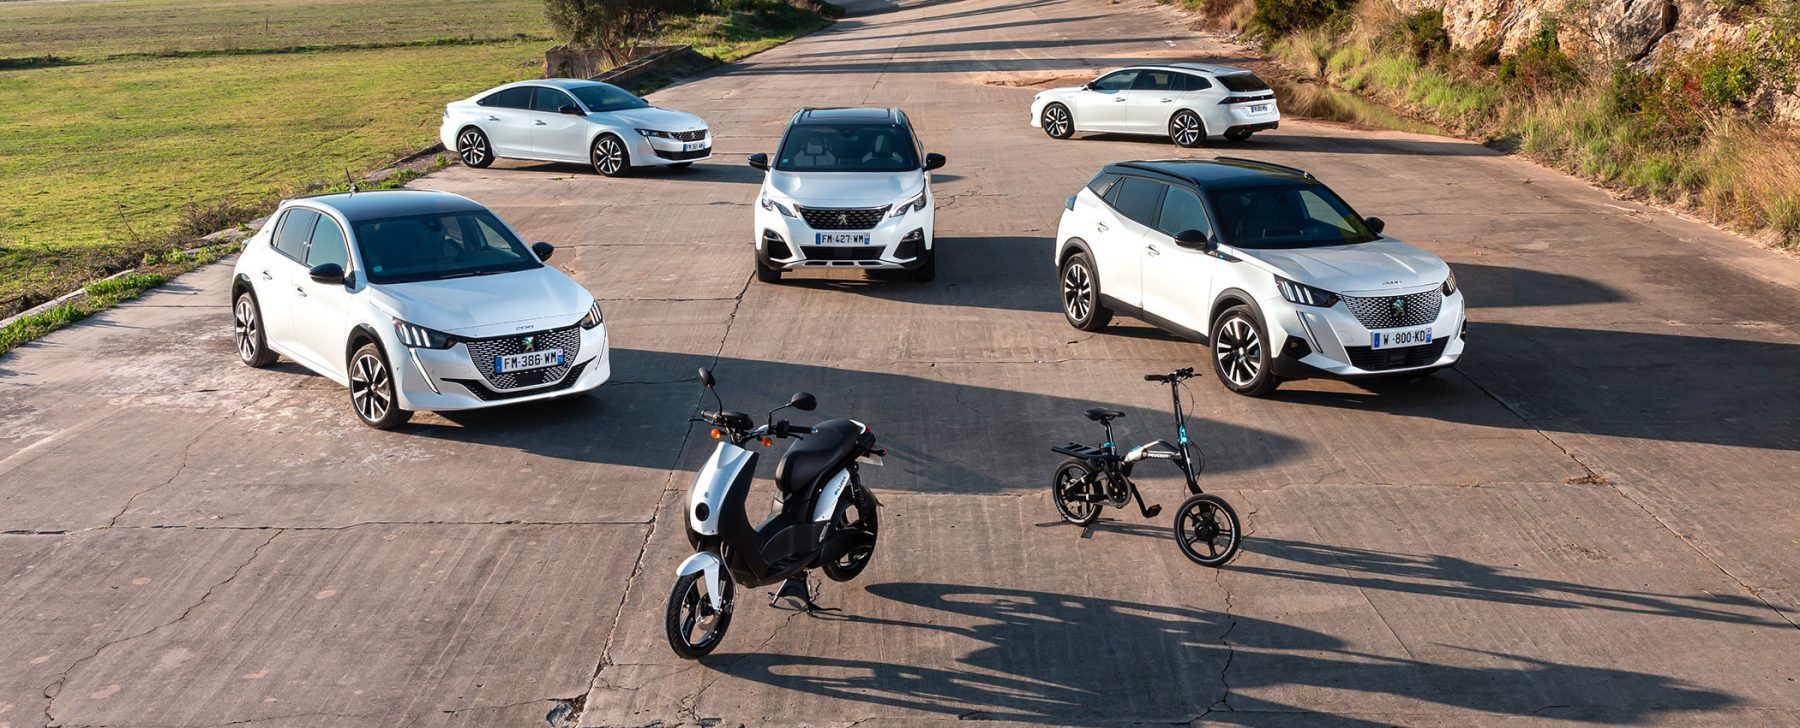 La gran ofensiva de Peugeot para obtener la etiqueta Cero de la DGT